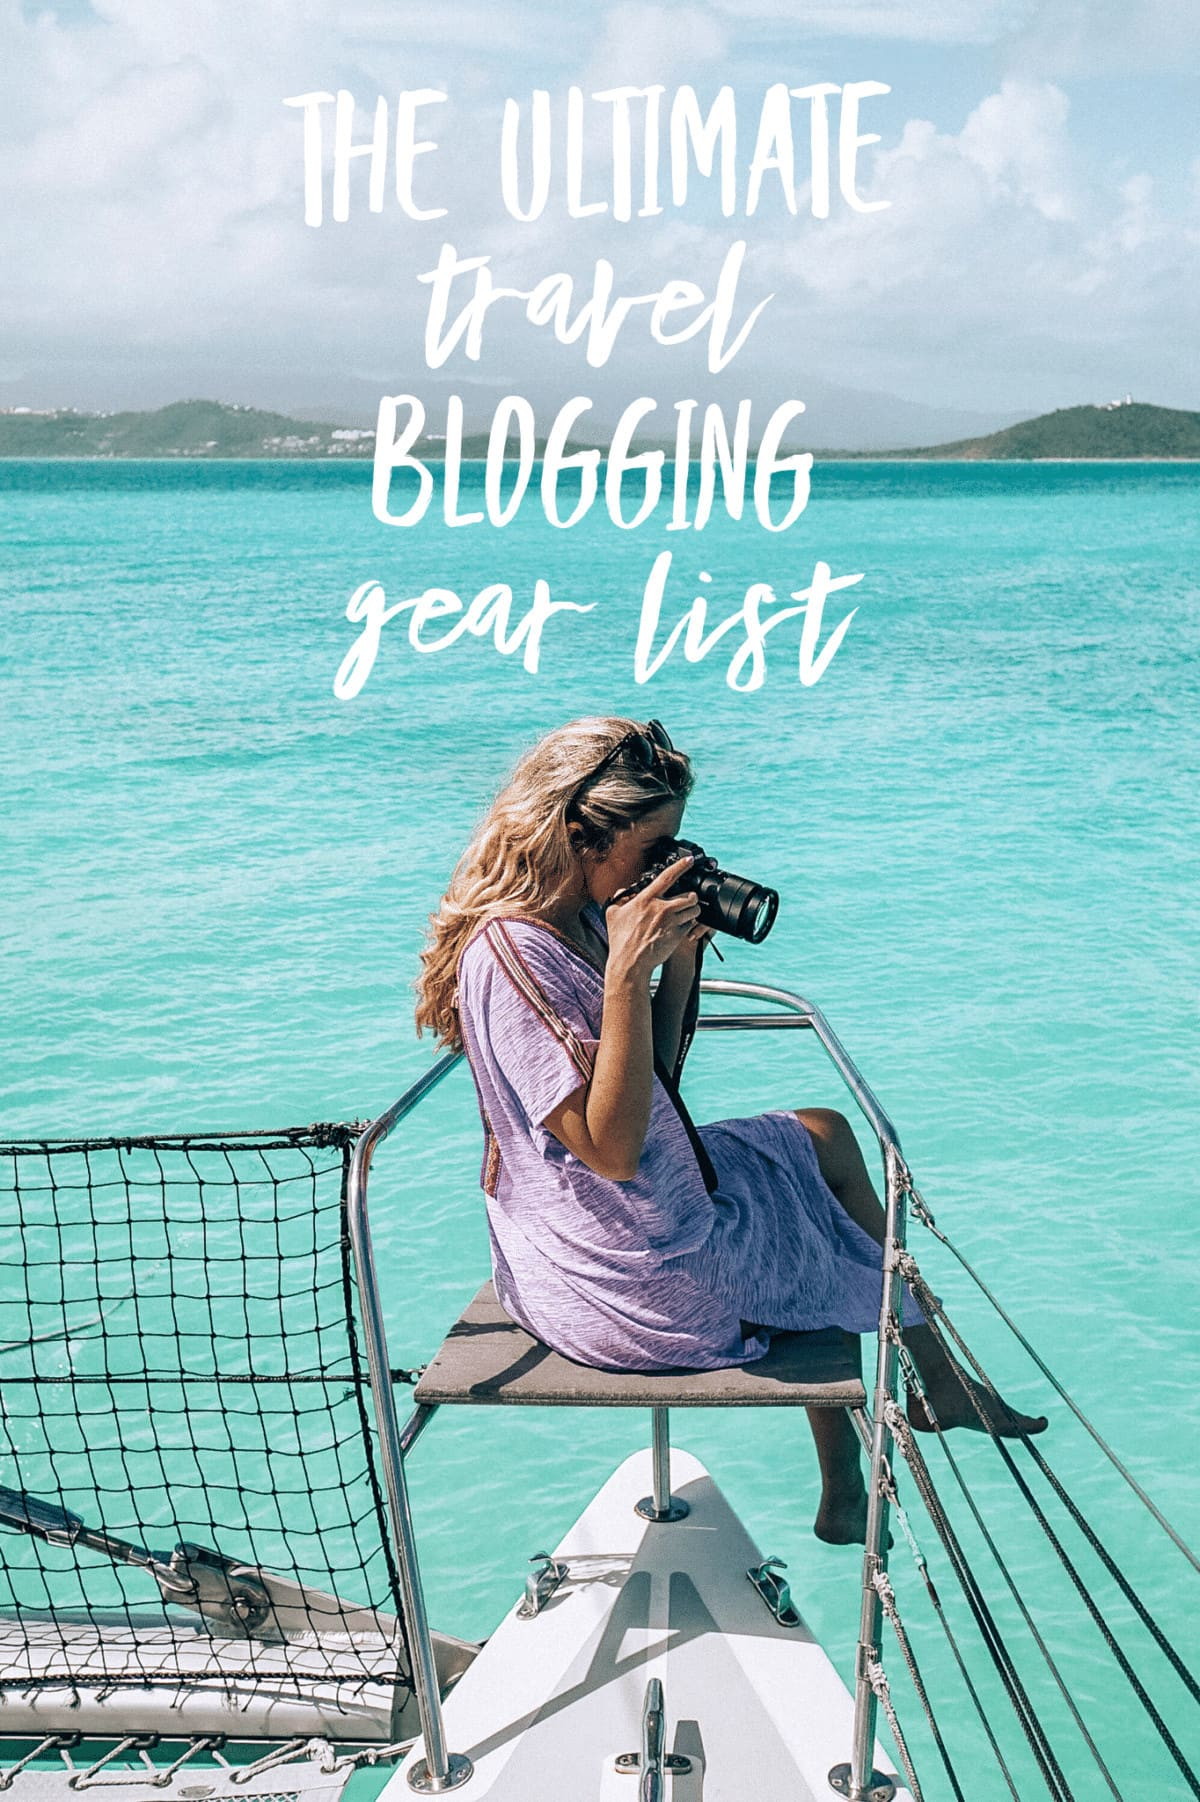 Travel Blogging Gear List! All My Tech + Camera Gear, 2018 Edition (Plus Links!)